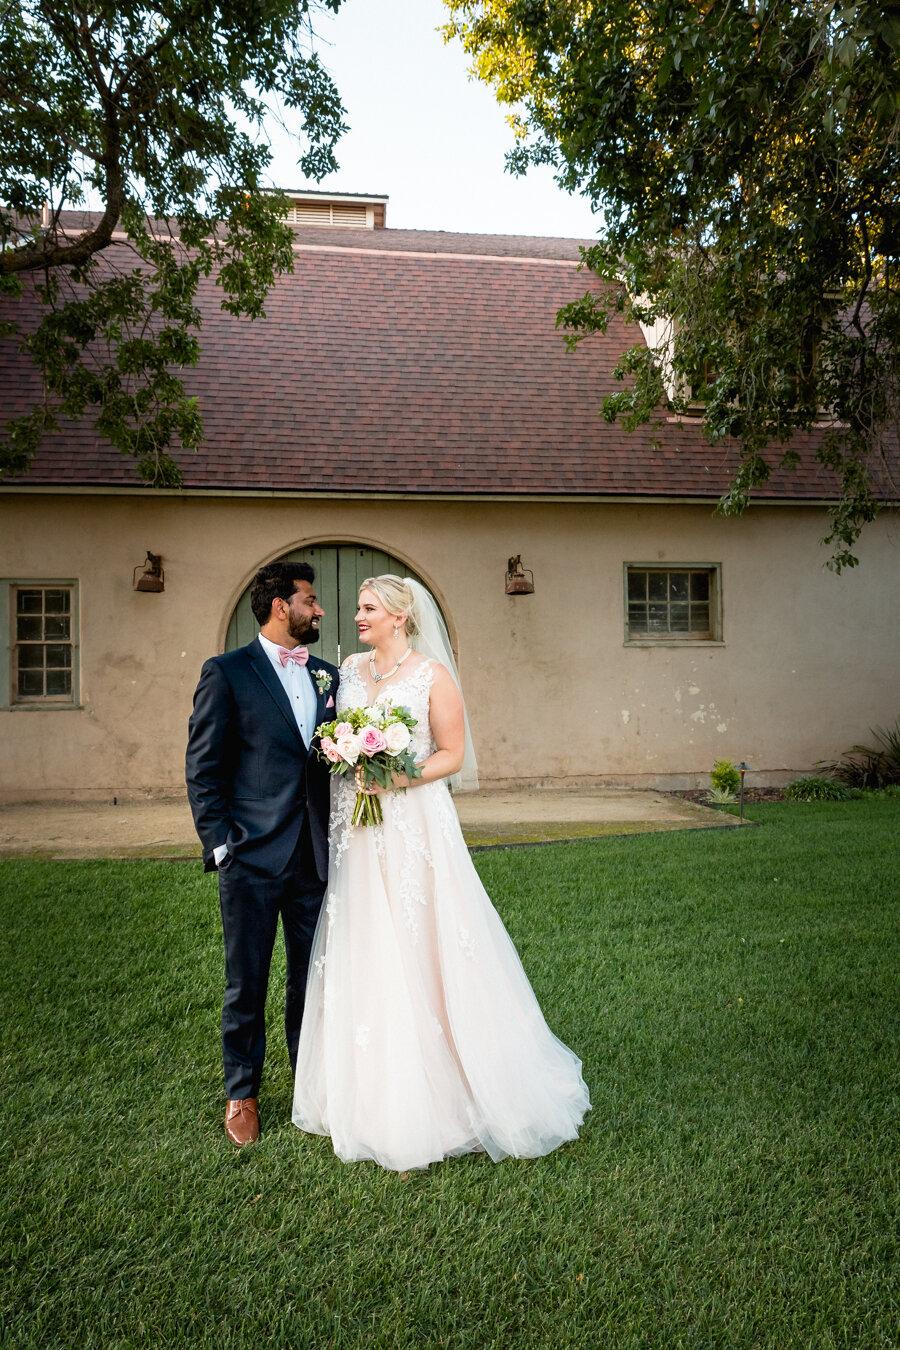 2019.08.24_Emily-Ashir-Wedding-at-the-Maples-6252.jpg